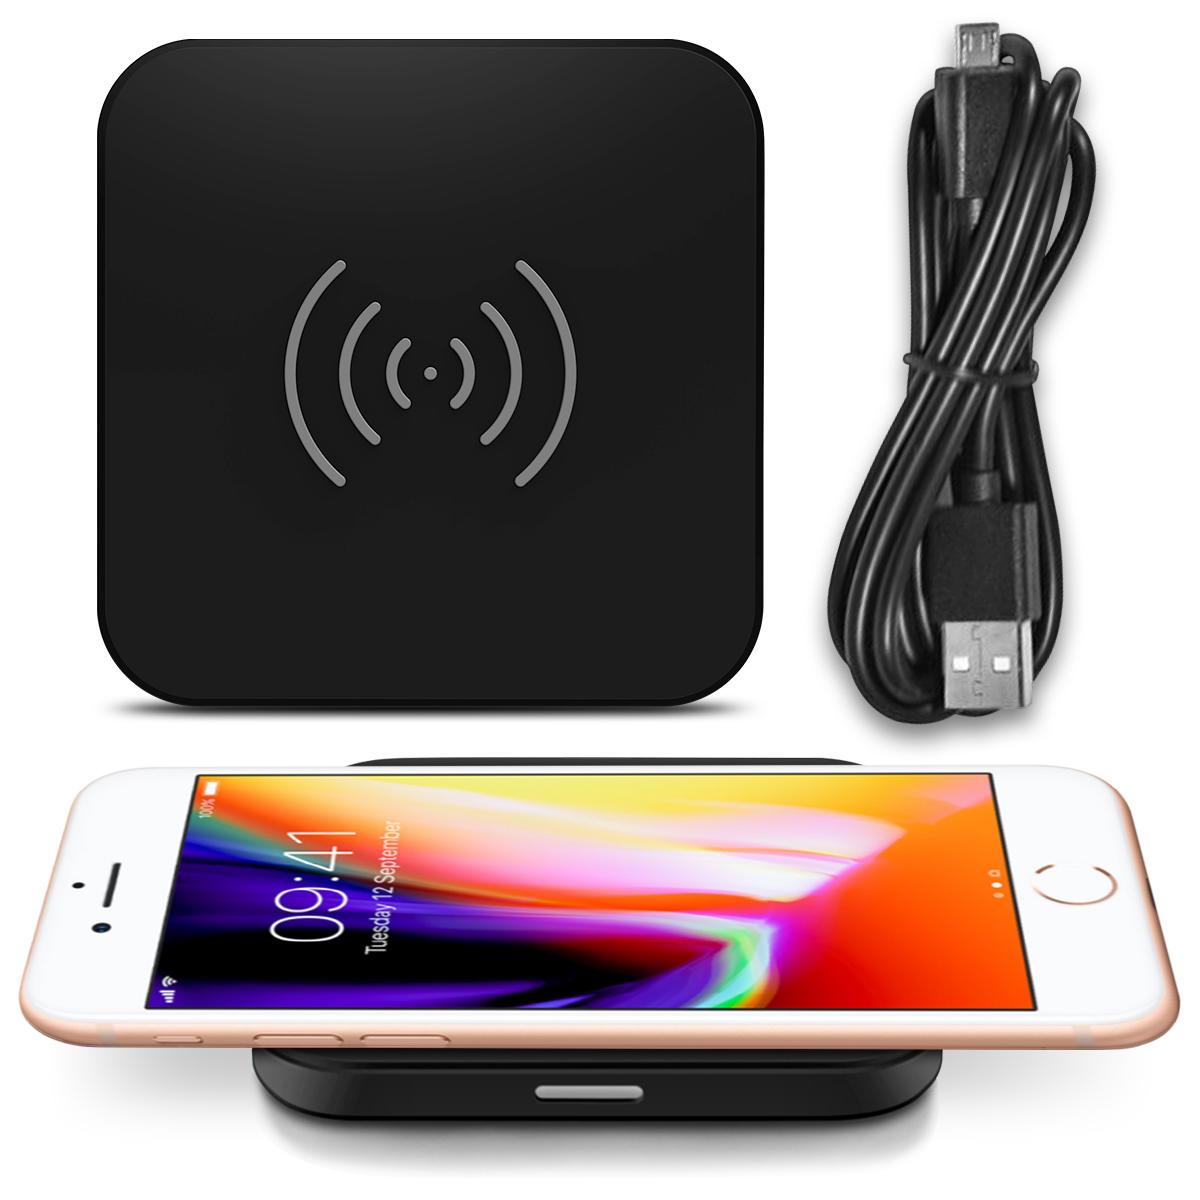 qi wireless ladestation apple iphone 8 plus kabellos induktives schnellladeger t technik kfz. Black Bedroom Furniture Sets. Home Design Ideas